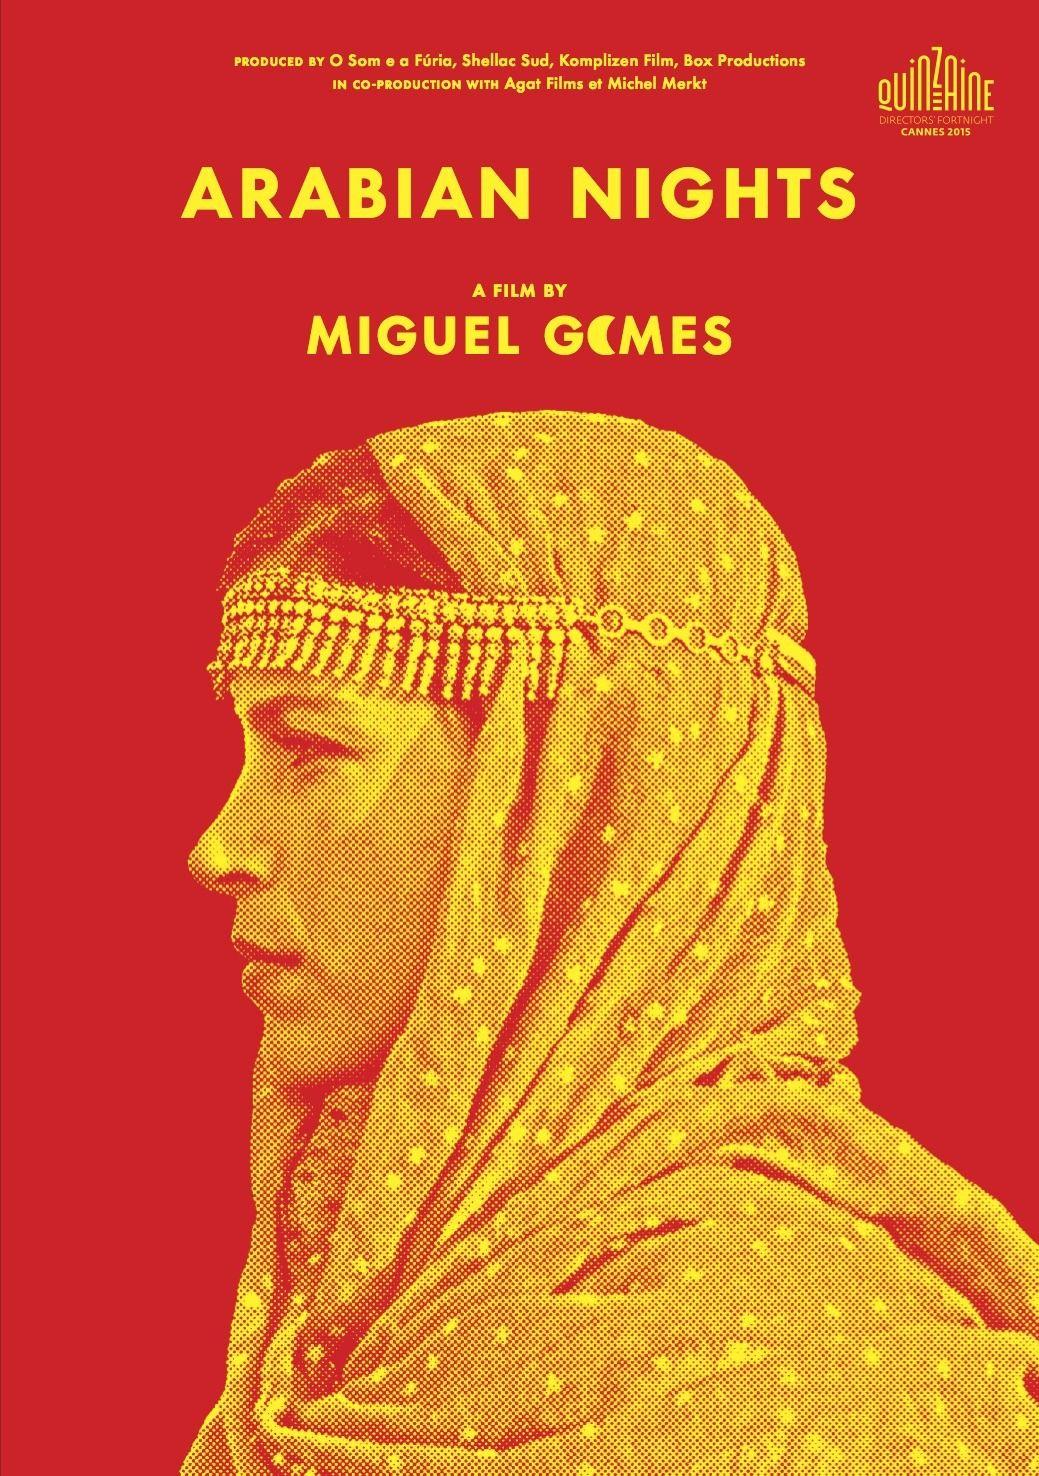 Arabian Nights Pelicula Completa Español movie posters에 있는 olly gibbs님의 핀